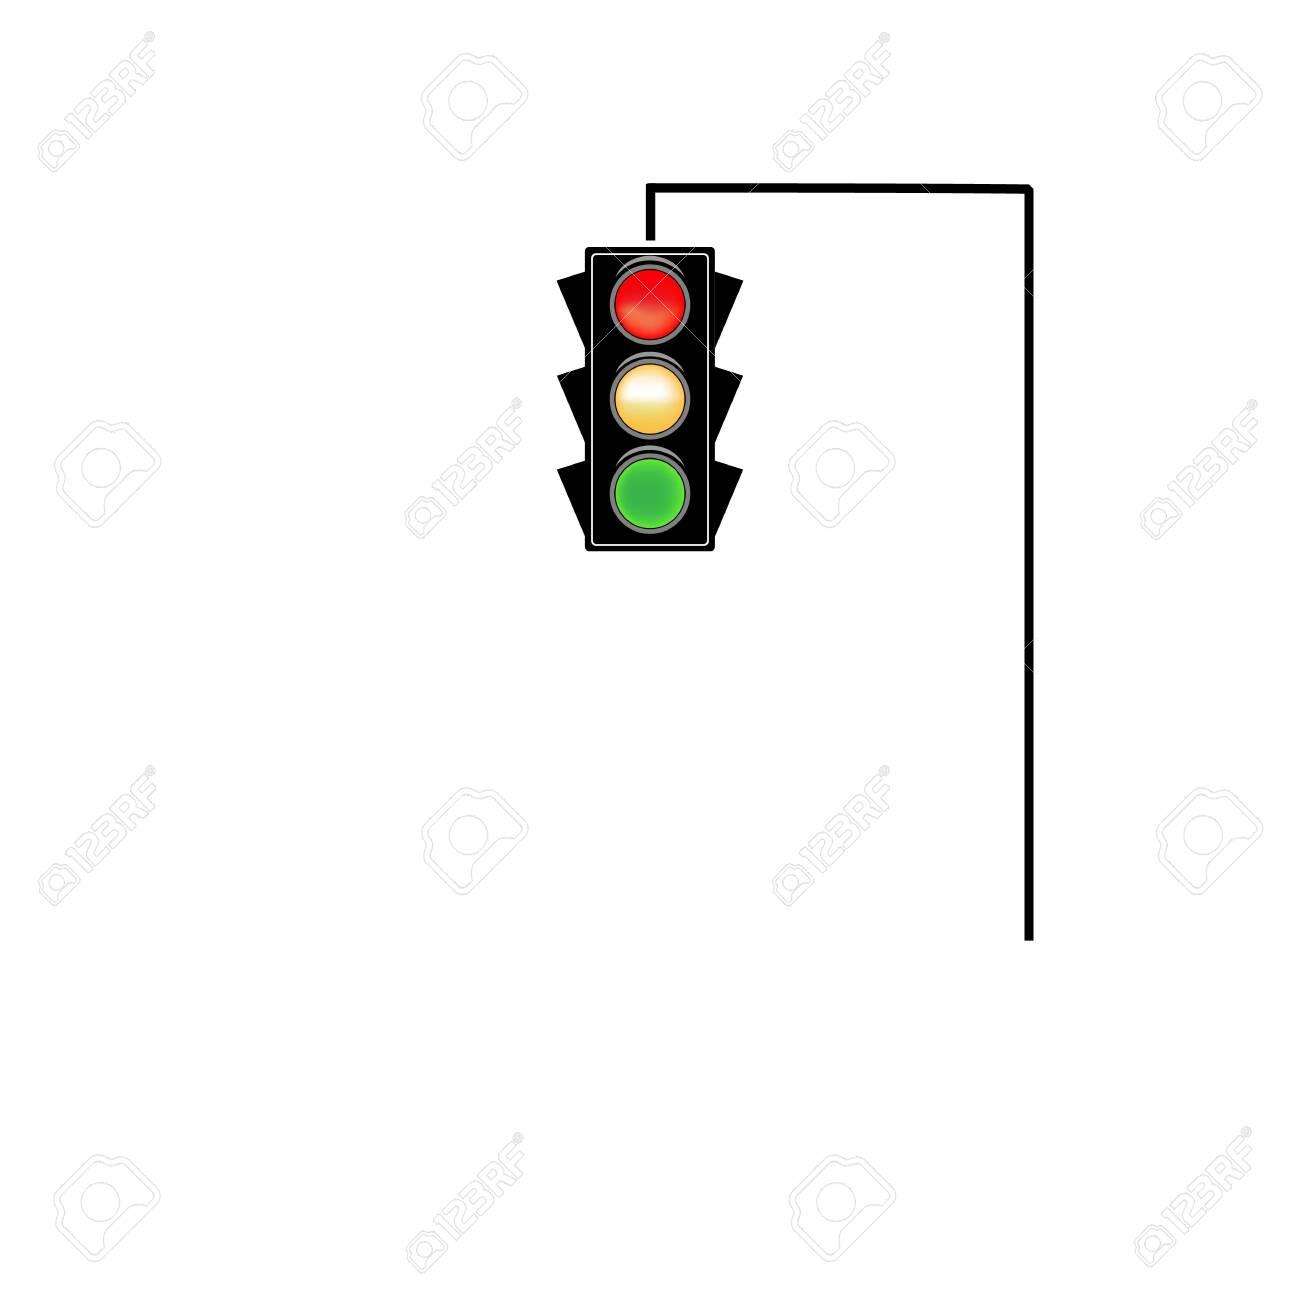 Stoplight sign. Icon traffic light on white background. Symbol regulate movement safety and warning. Electricity semaphore regulate transportation on crossroads urban road. Flat vector illustration - 149911541